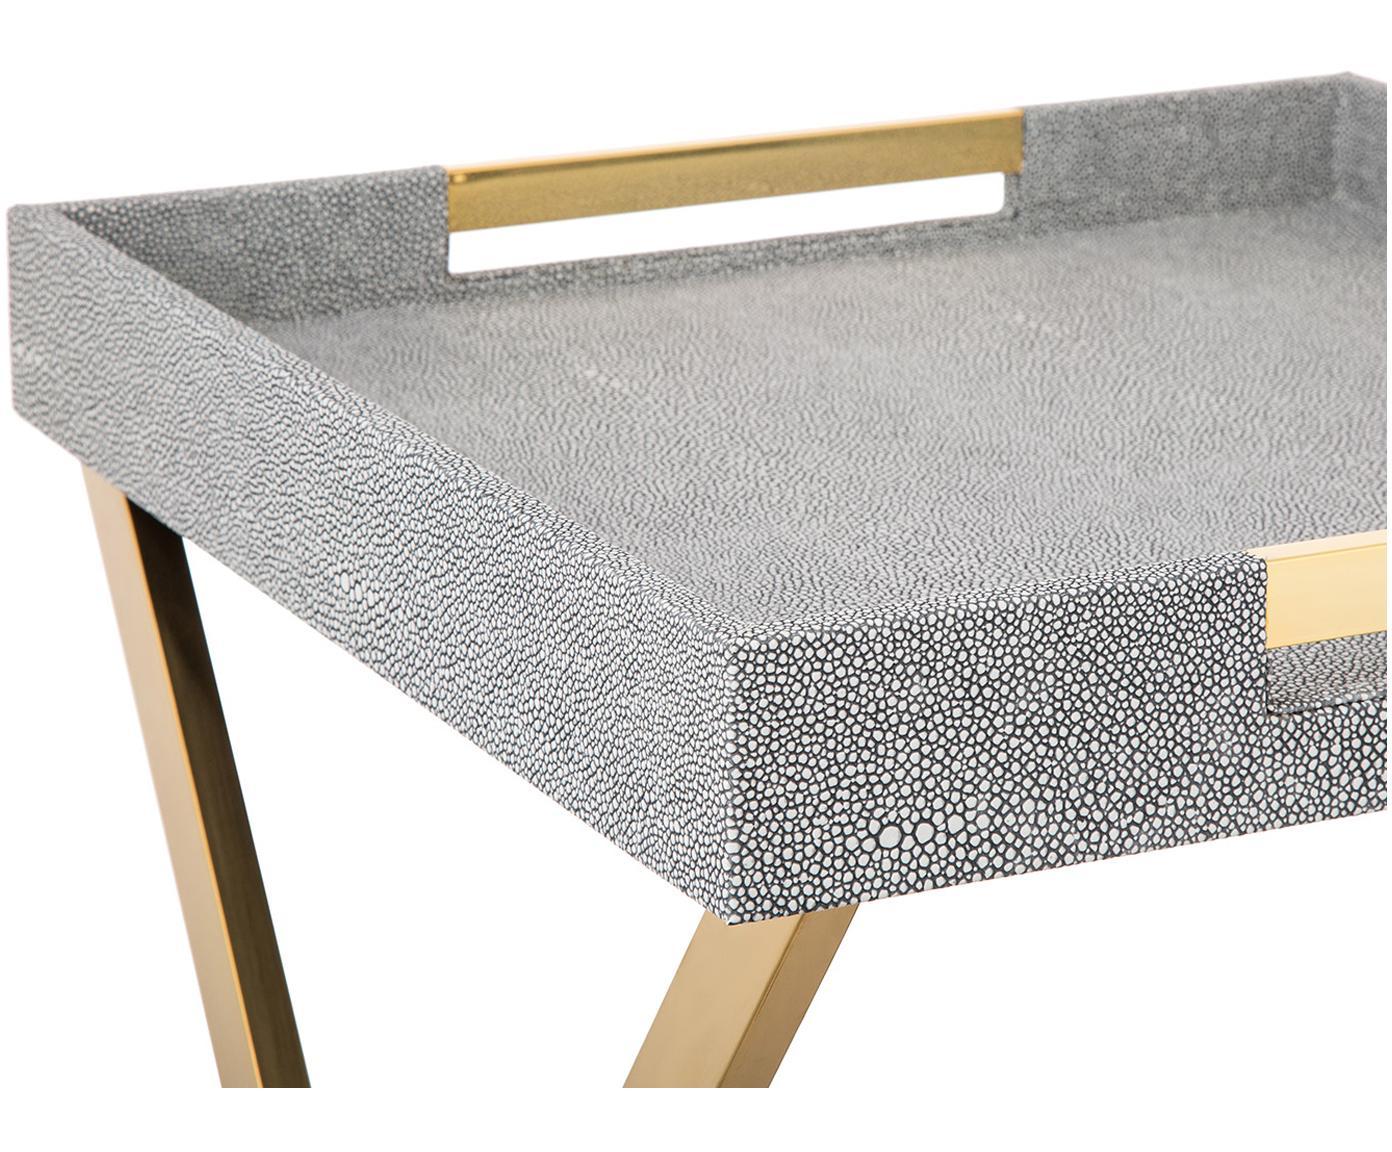 Dienbladtafel Megan, Frame: metaal, Dienblad: MDF (Medium-density fibre, Handvatten: metaal, Donkergrijs, 46 x 55 cm